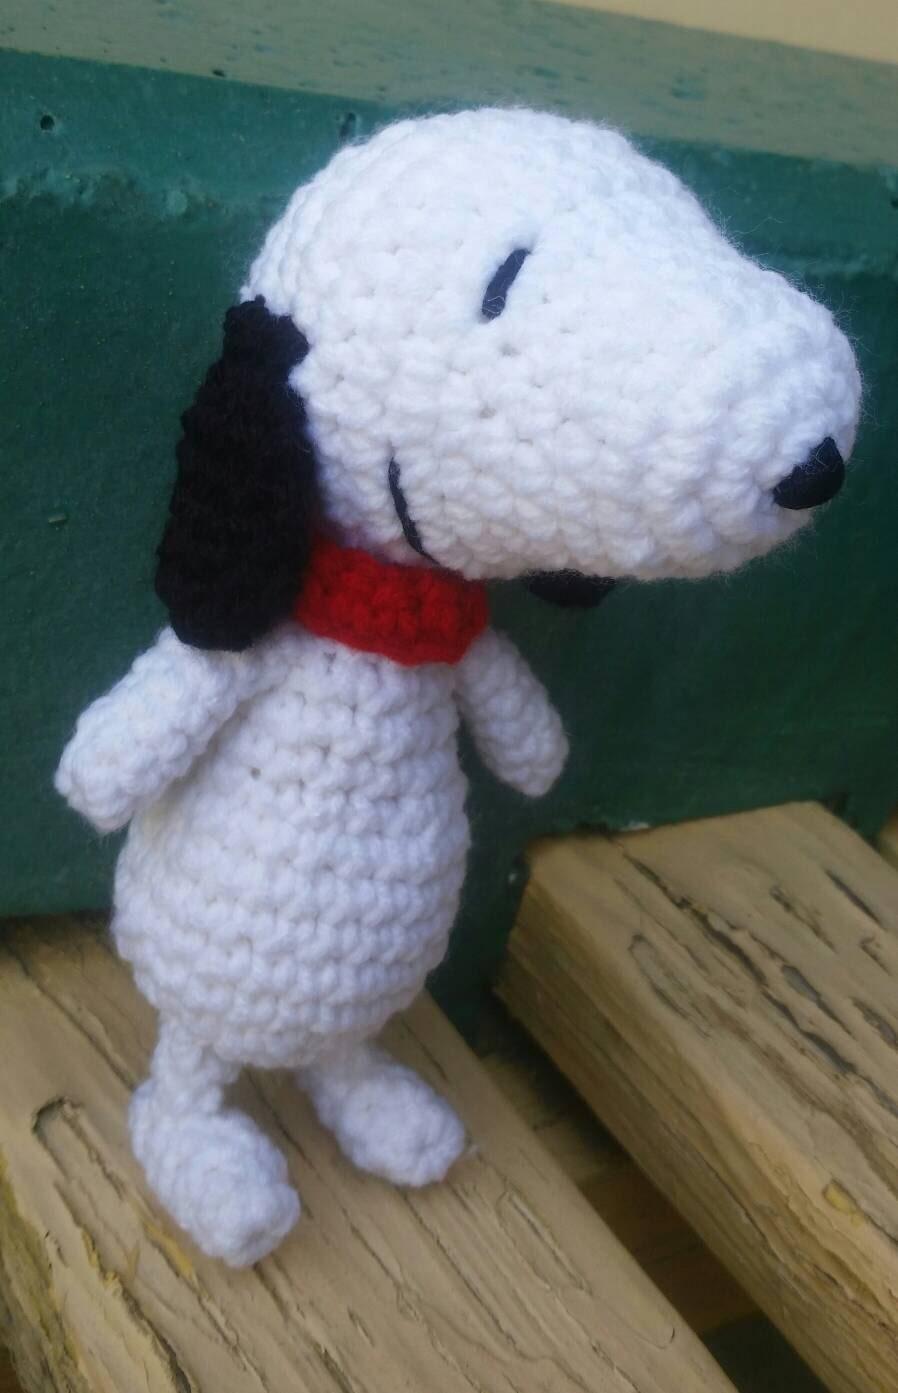 Amigurumi Crochet Toys : Crochet snoopy toy. Stuffed toys. Amigurumi snoopy Charlie